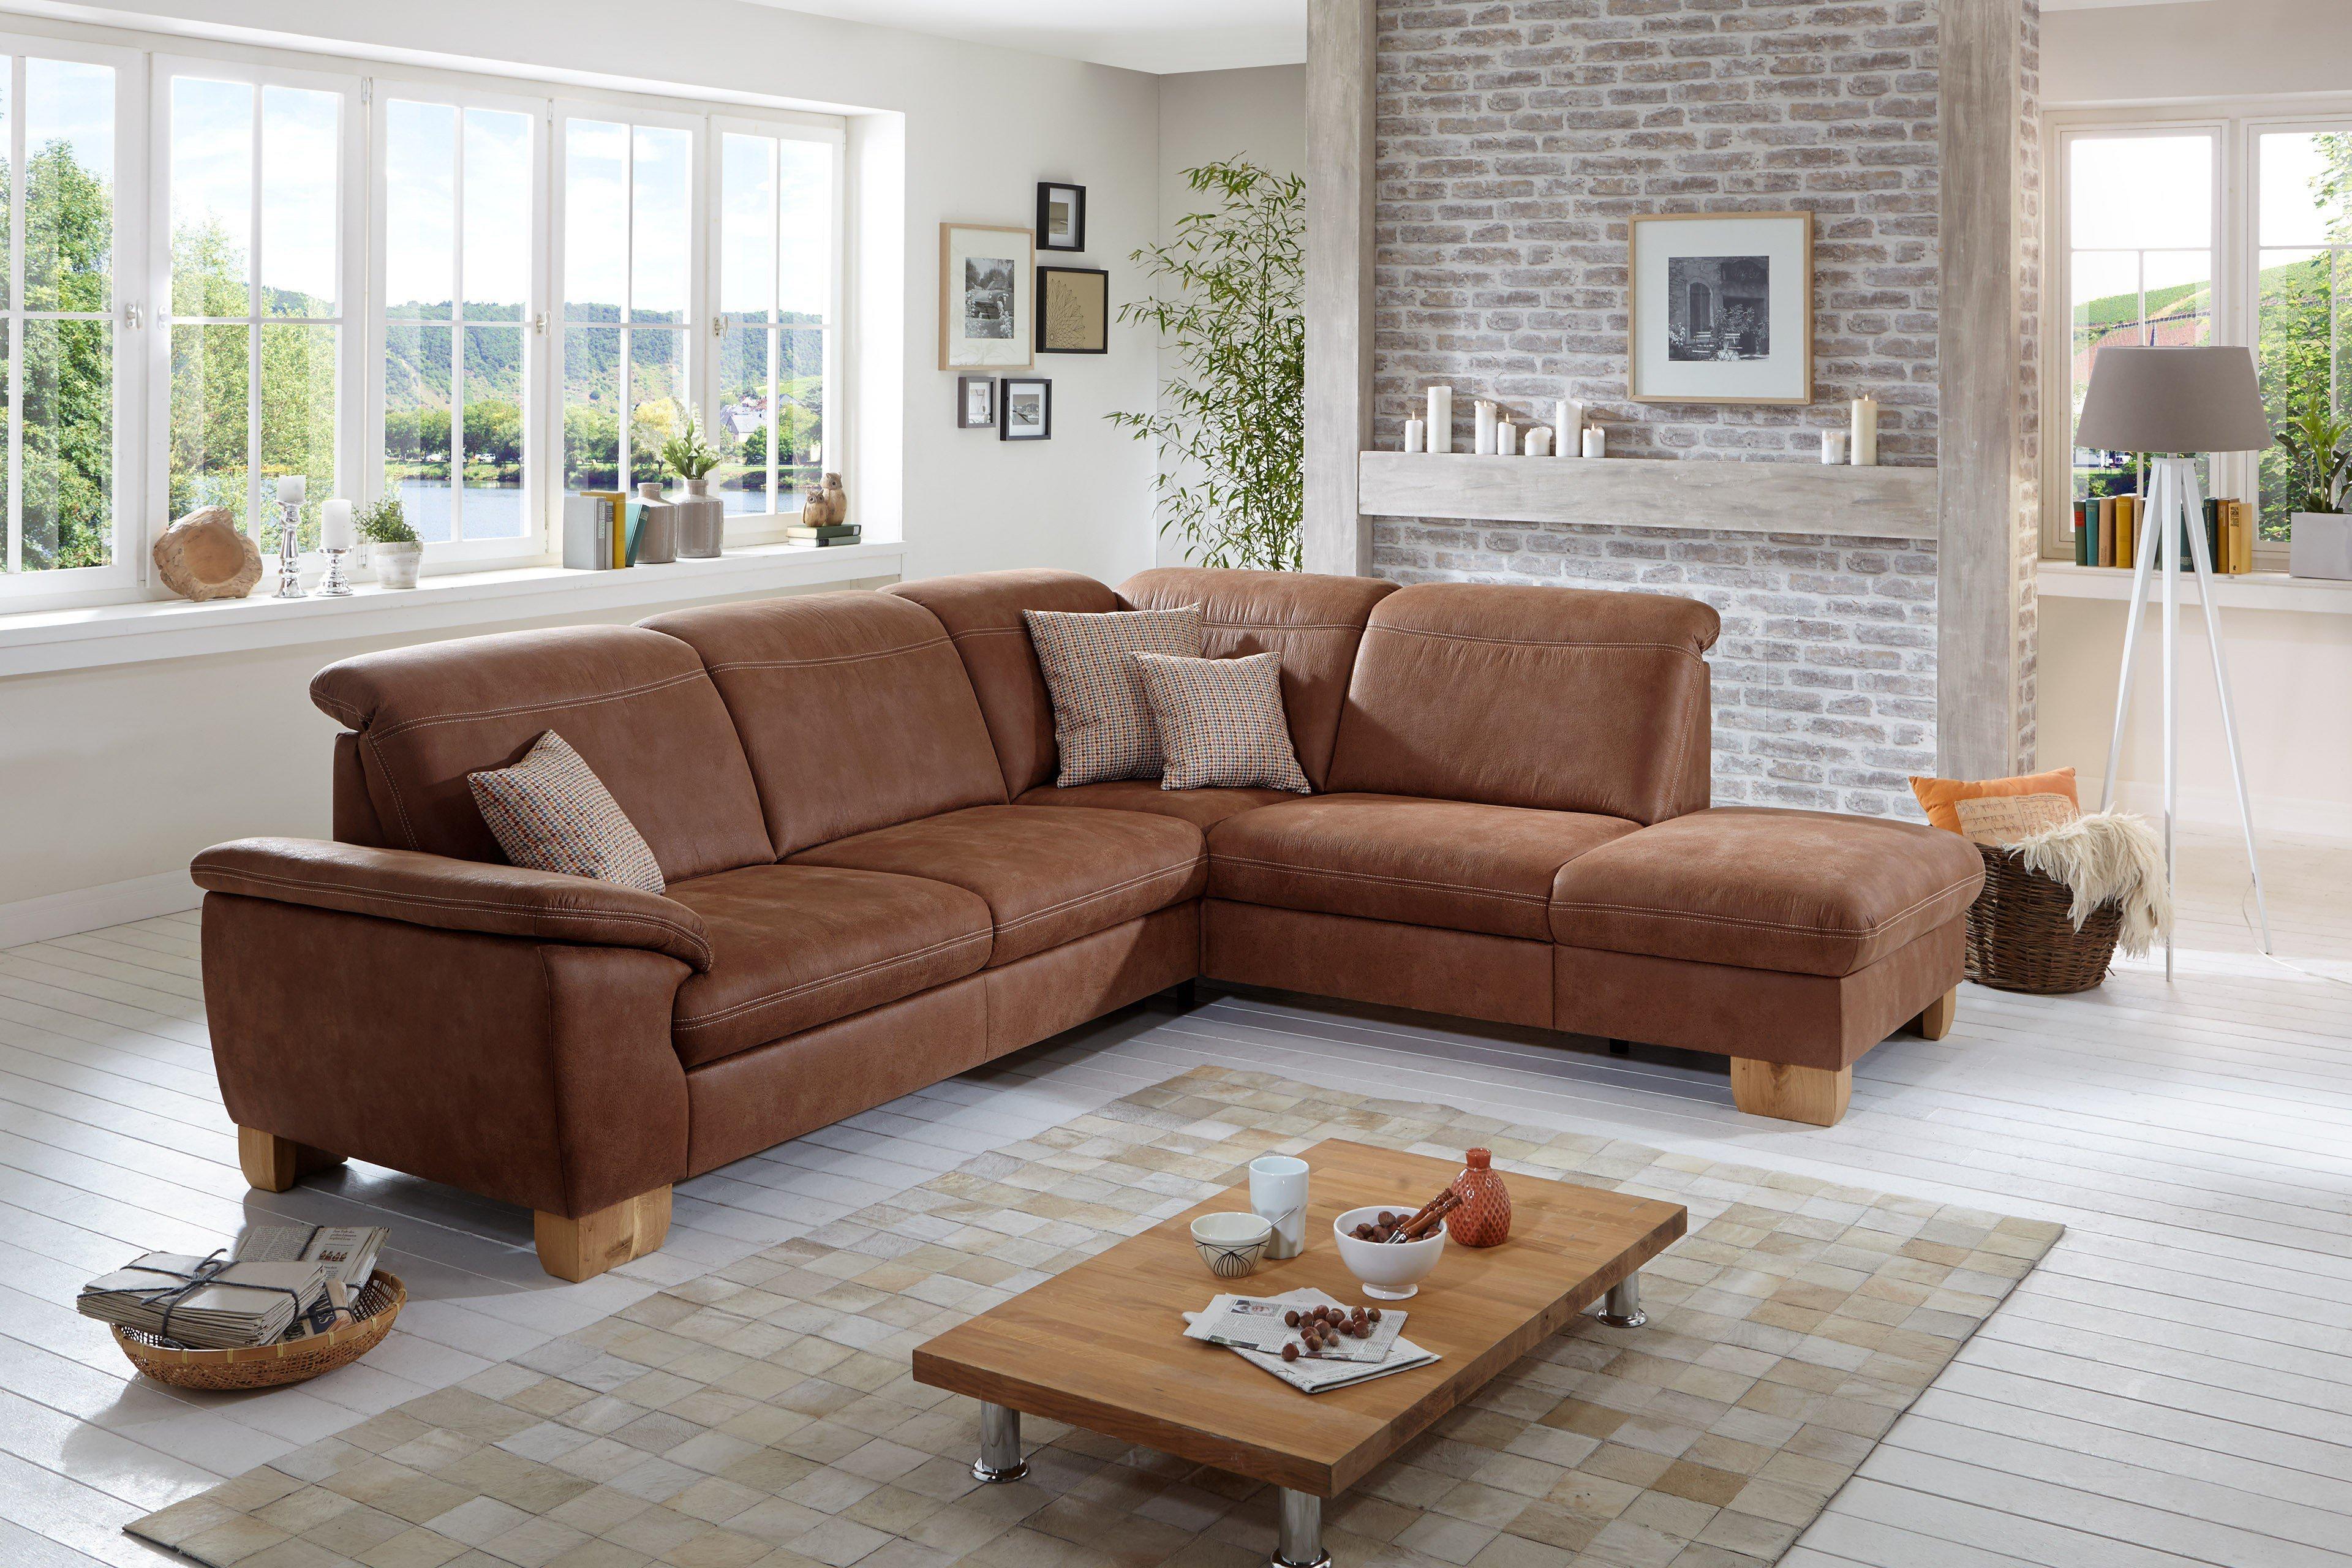 microfaser stoff fr sofa fabulous tolles home design kleines braun microfaser loft stoff grau. Black Bedroom Furniture Sets. Home Design Ideas